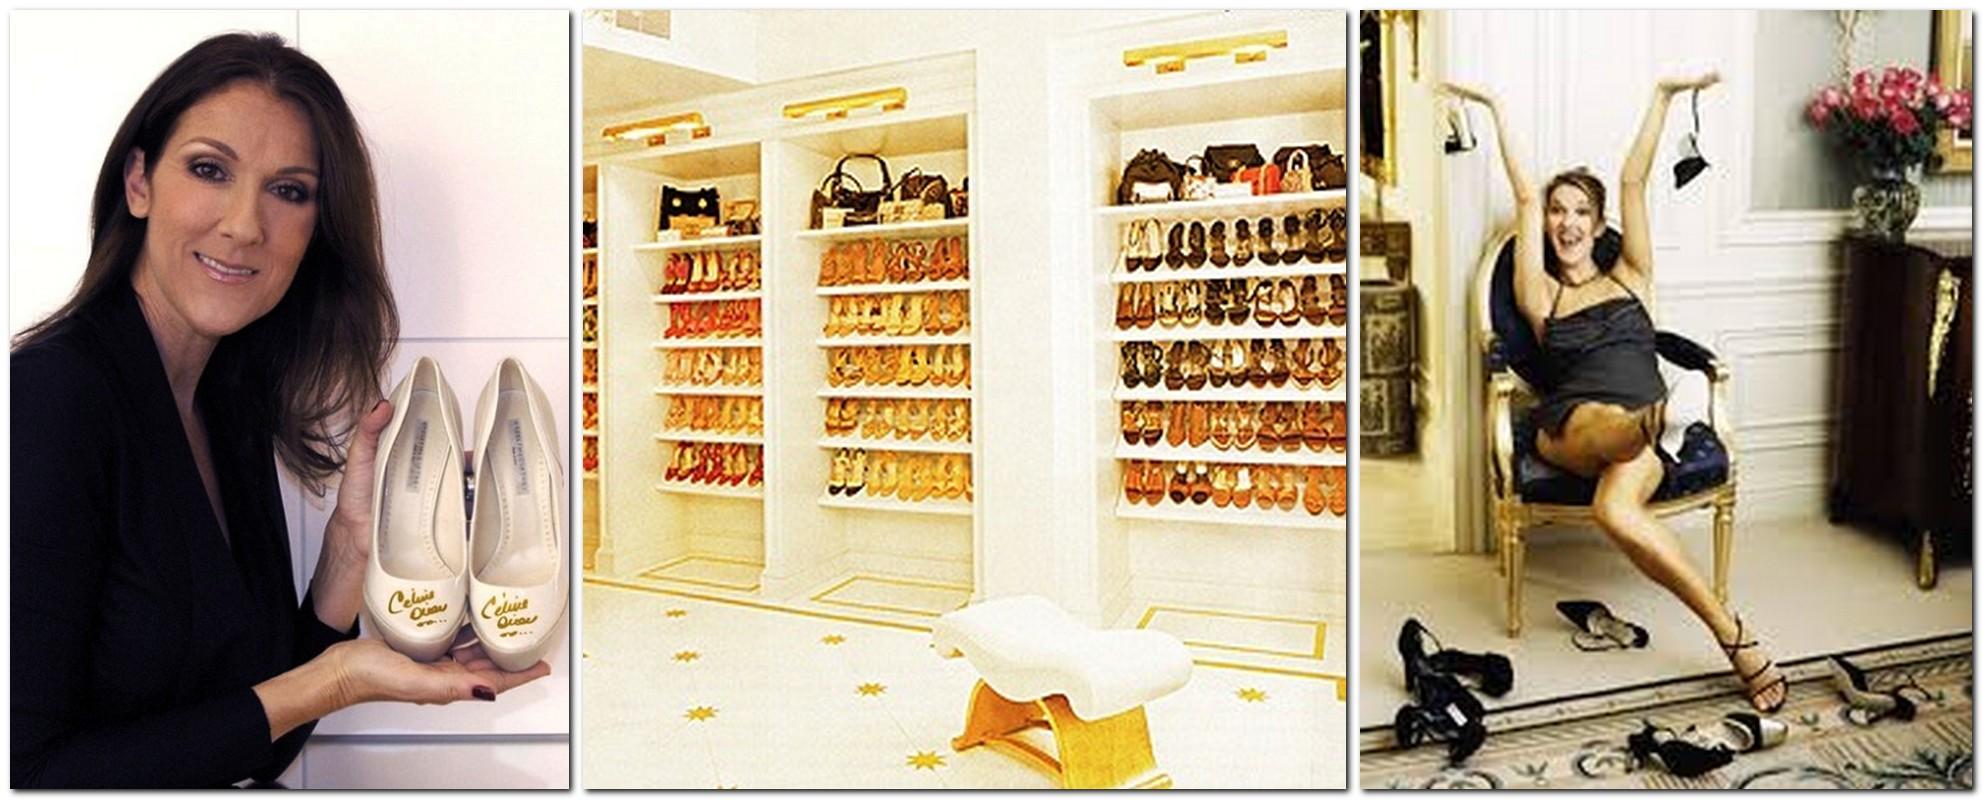 Celine Dion has 3000 pairs